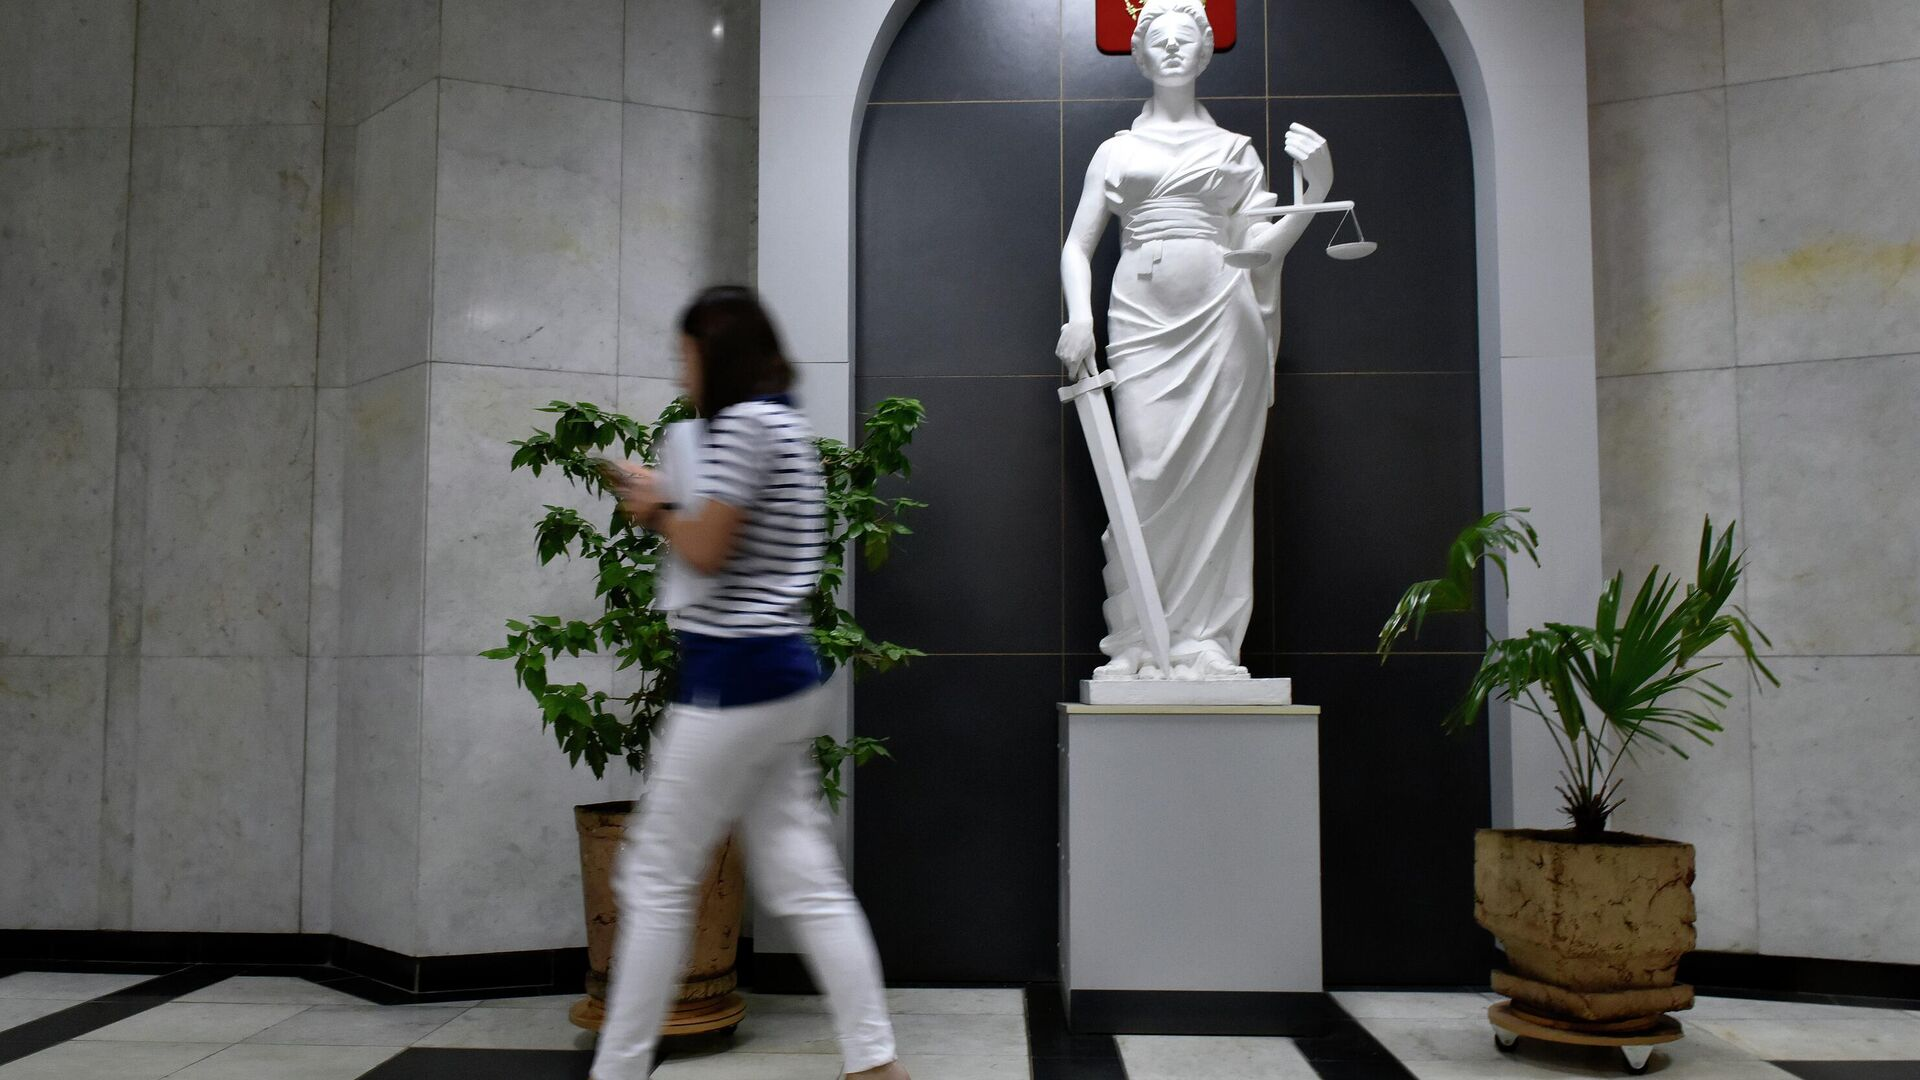 Статуя богини правосудия (Фемида) в здании суда - РИА Новости, 1920, 05.07.2021